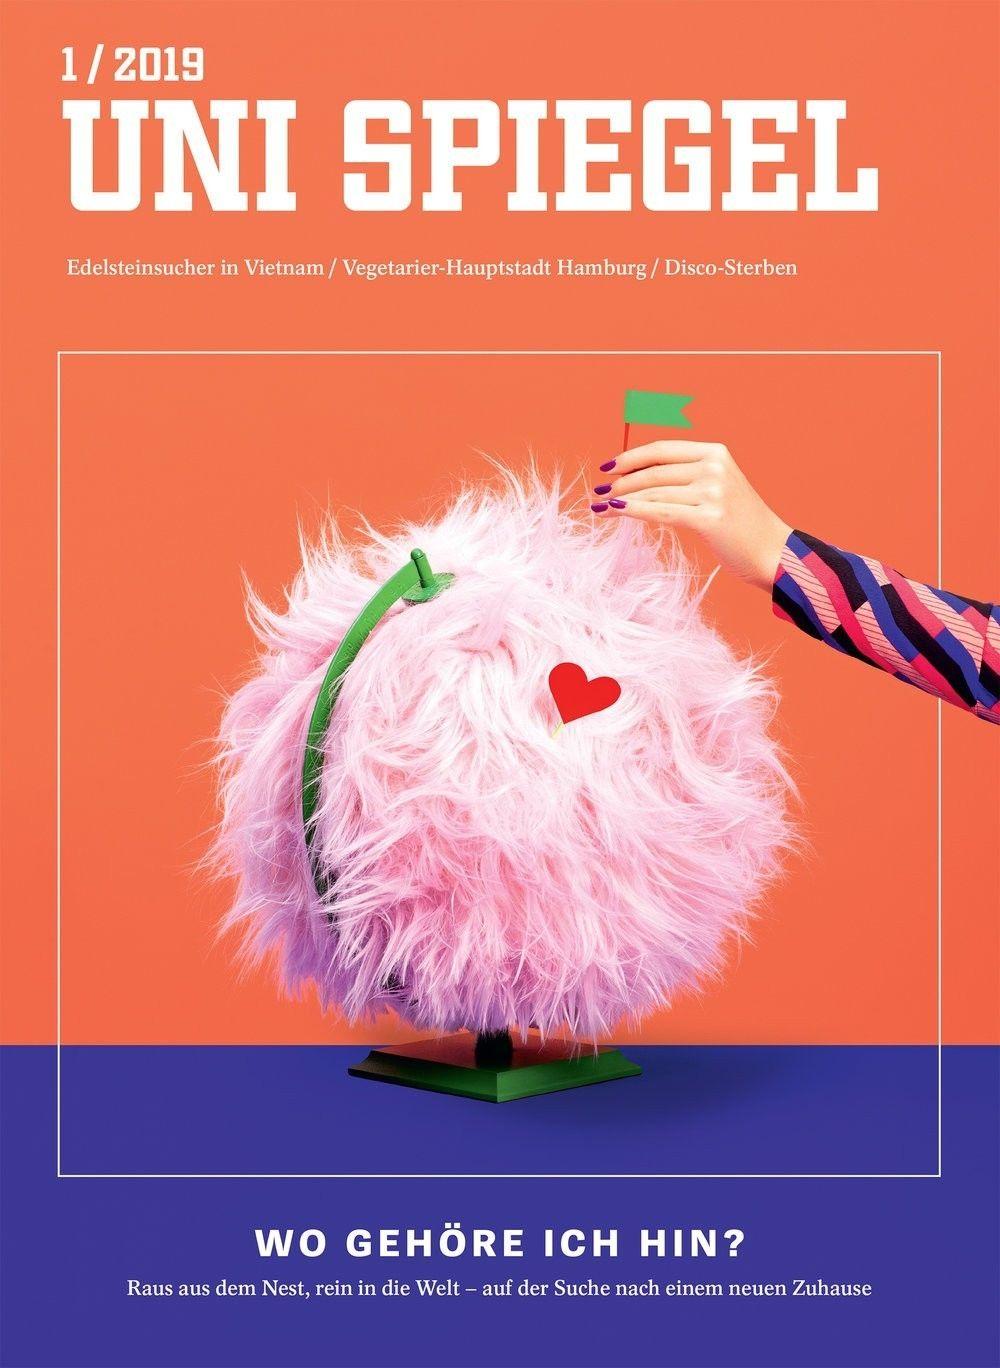 COSMOPOLA | Cover for  Uni Spiegel magazine by ILKA & FRANZ